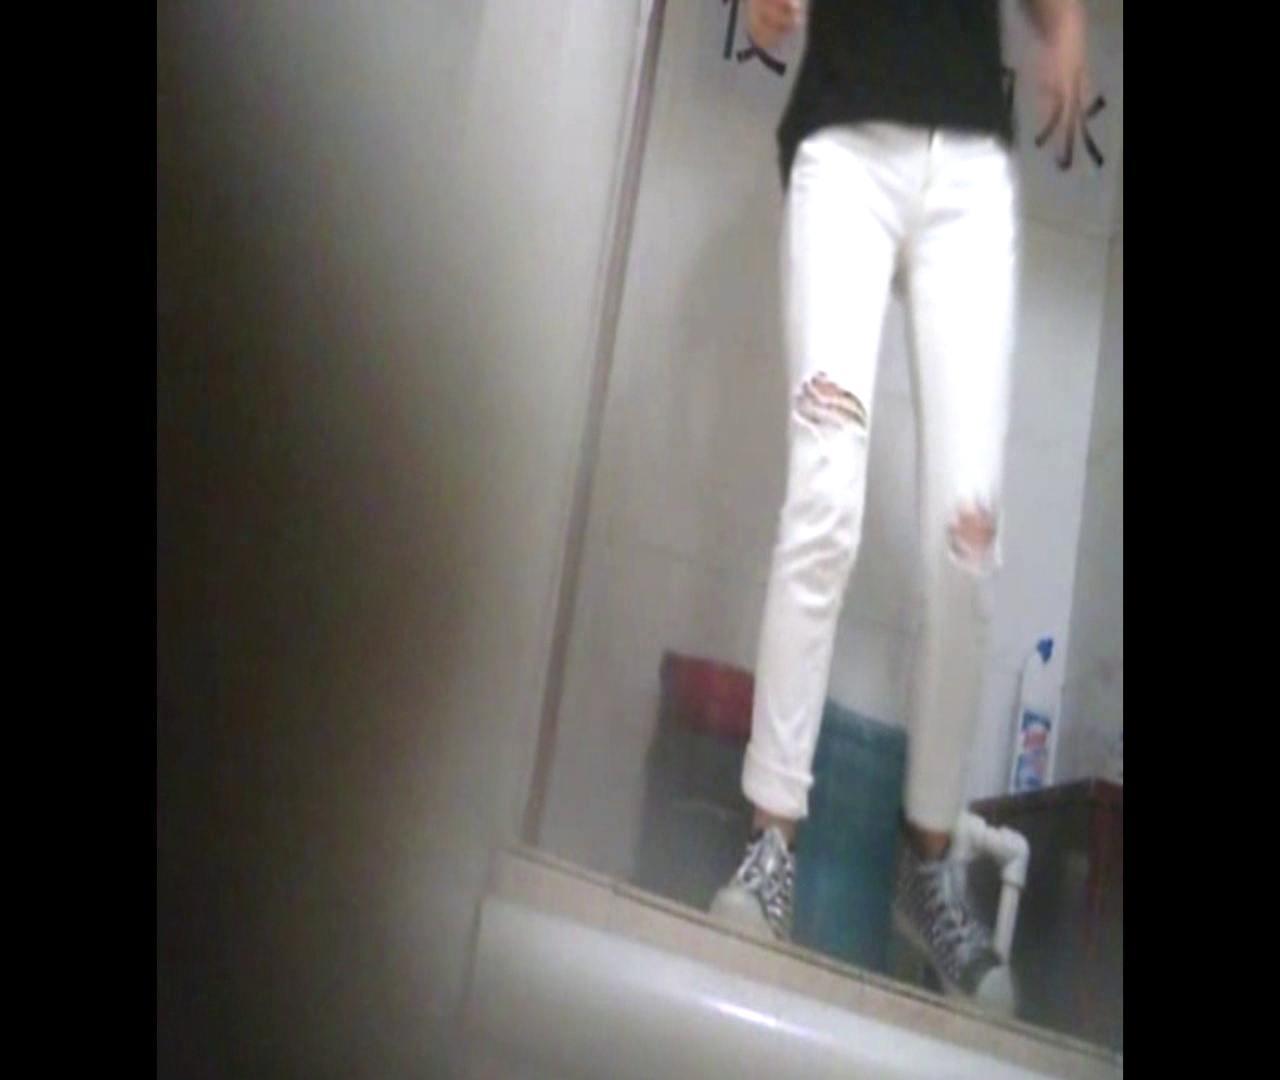 Vol.47 二度目の登場!絶対白いズボンの時は・・・ 丸見え  80枚 21